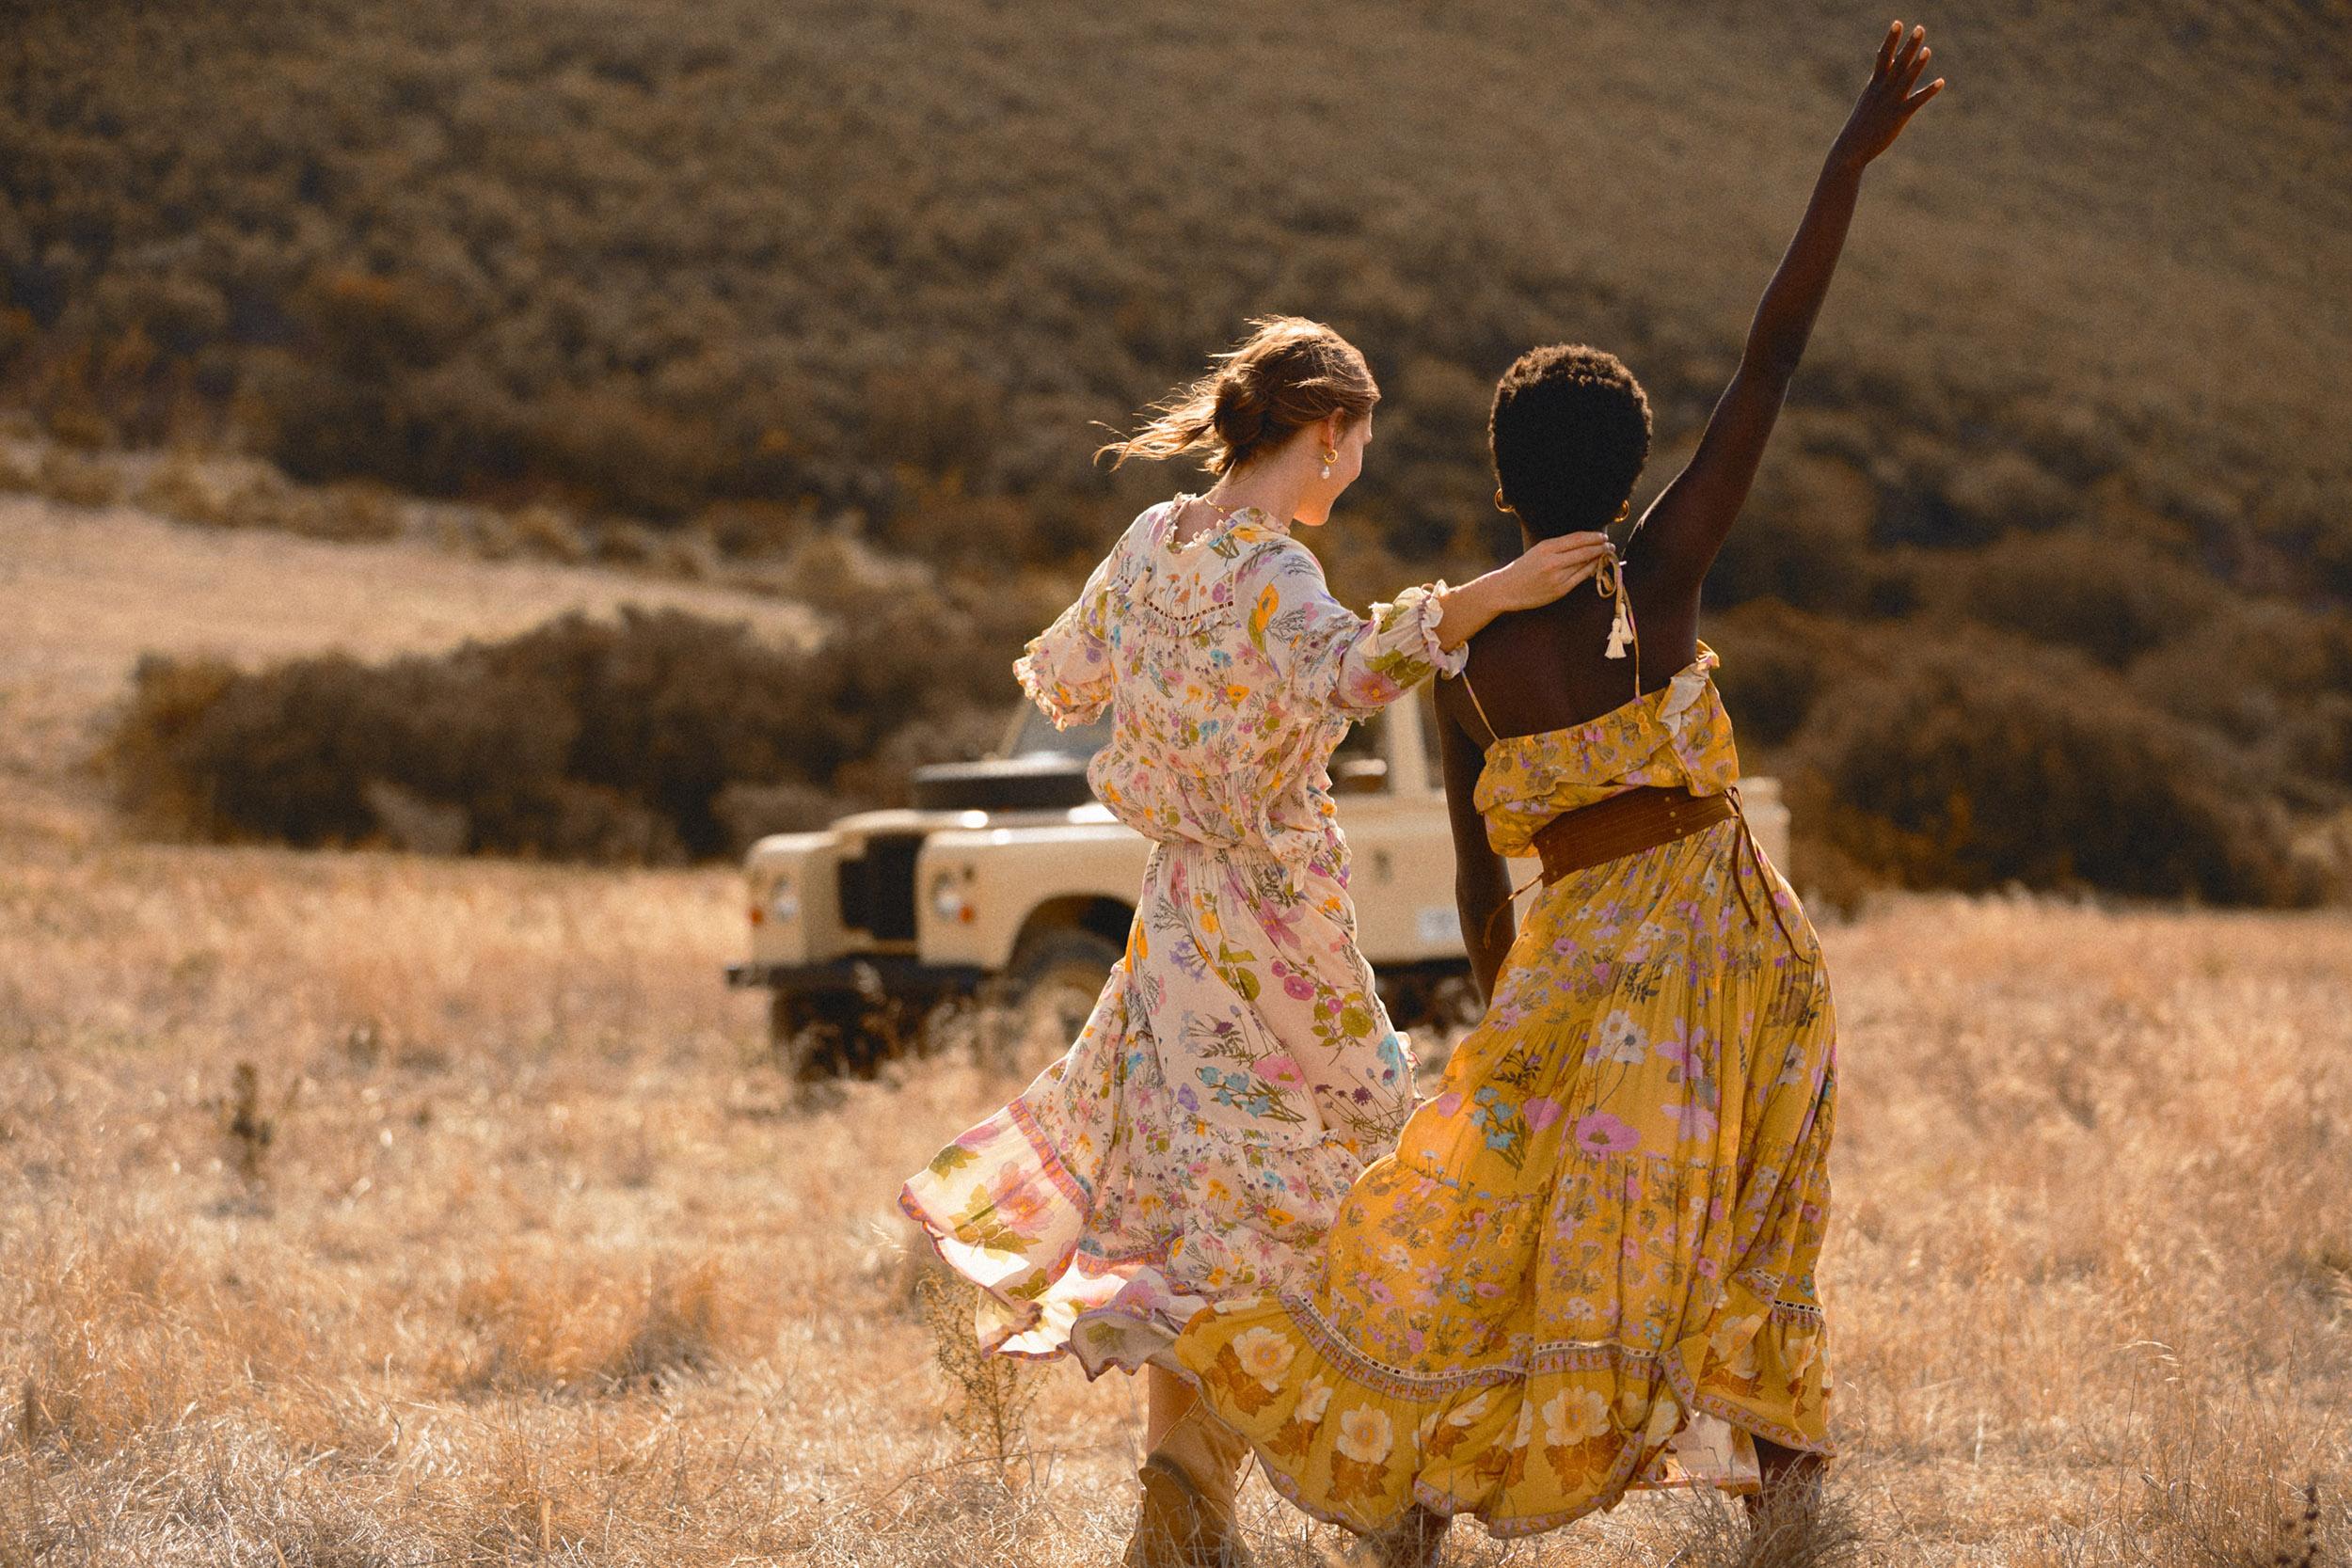 Spell-wild-bloom-strappy-maxi-dress-mustard-blouse-maxi-skirt-cream_D4_4153_HR.jpg